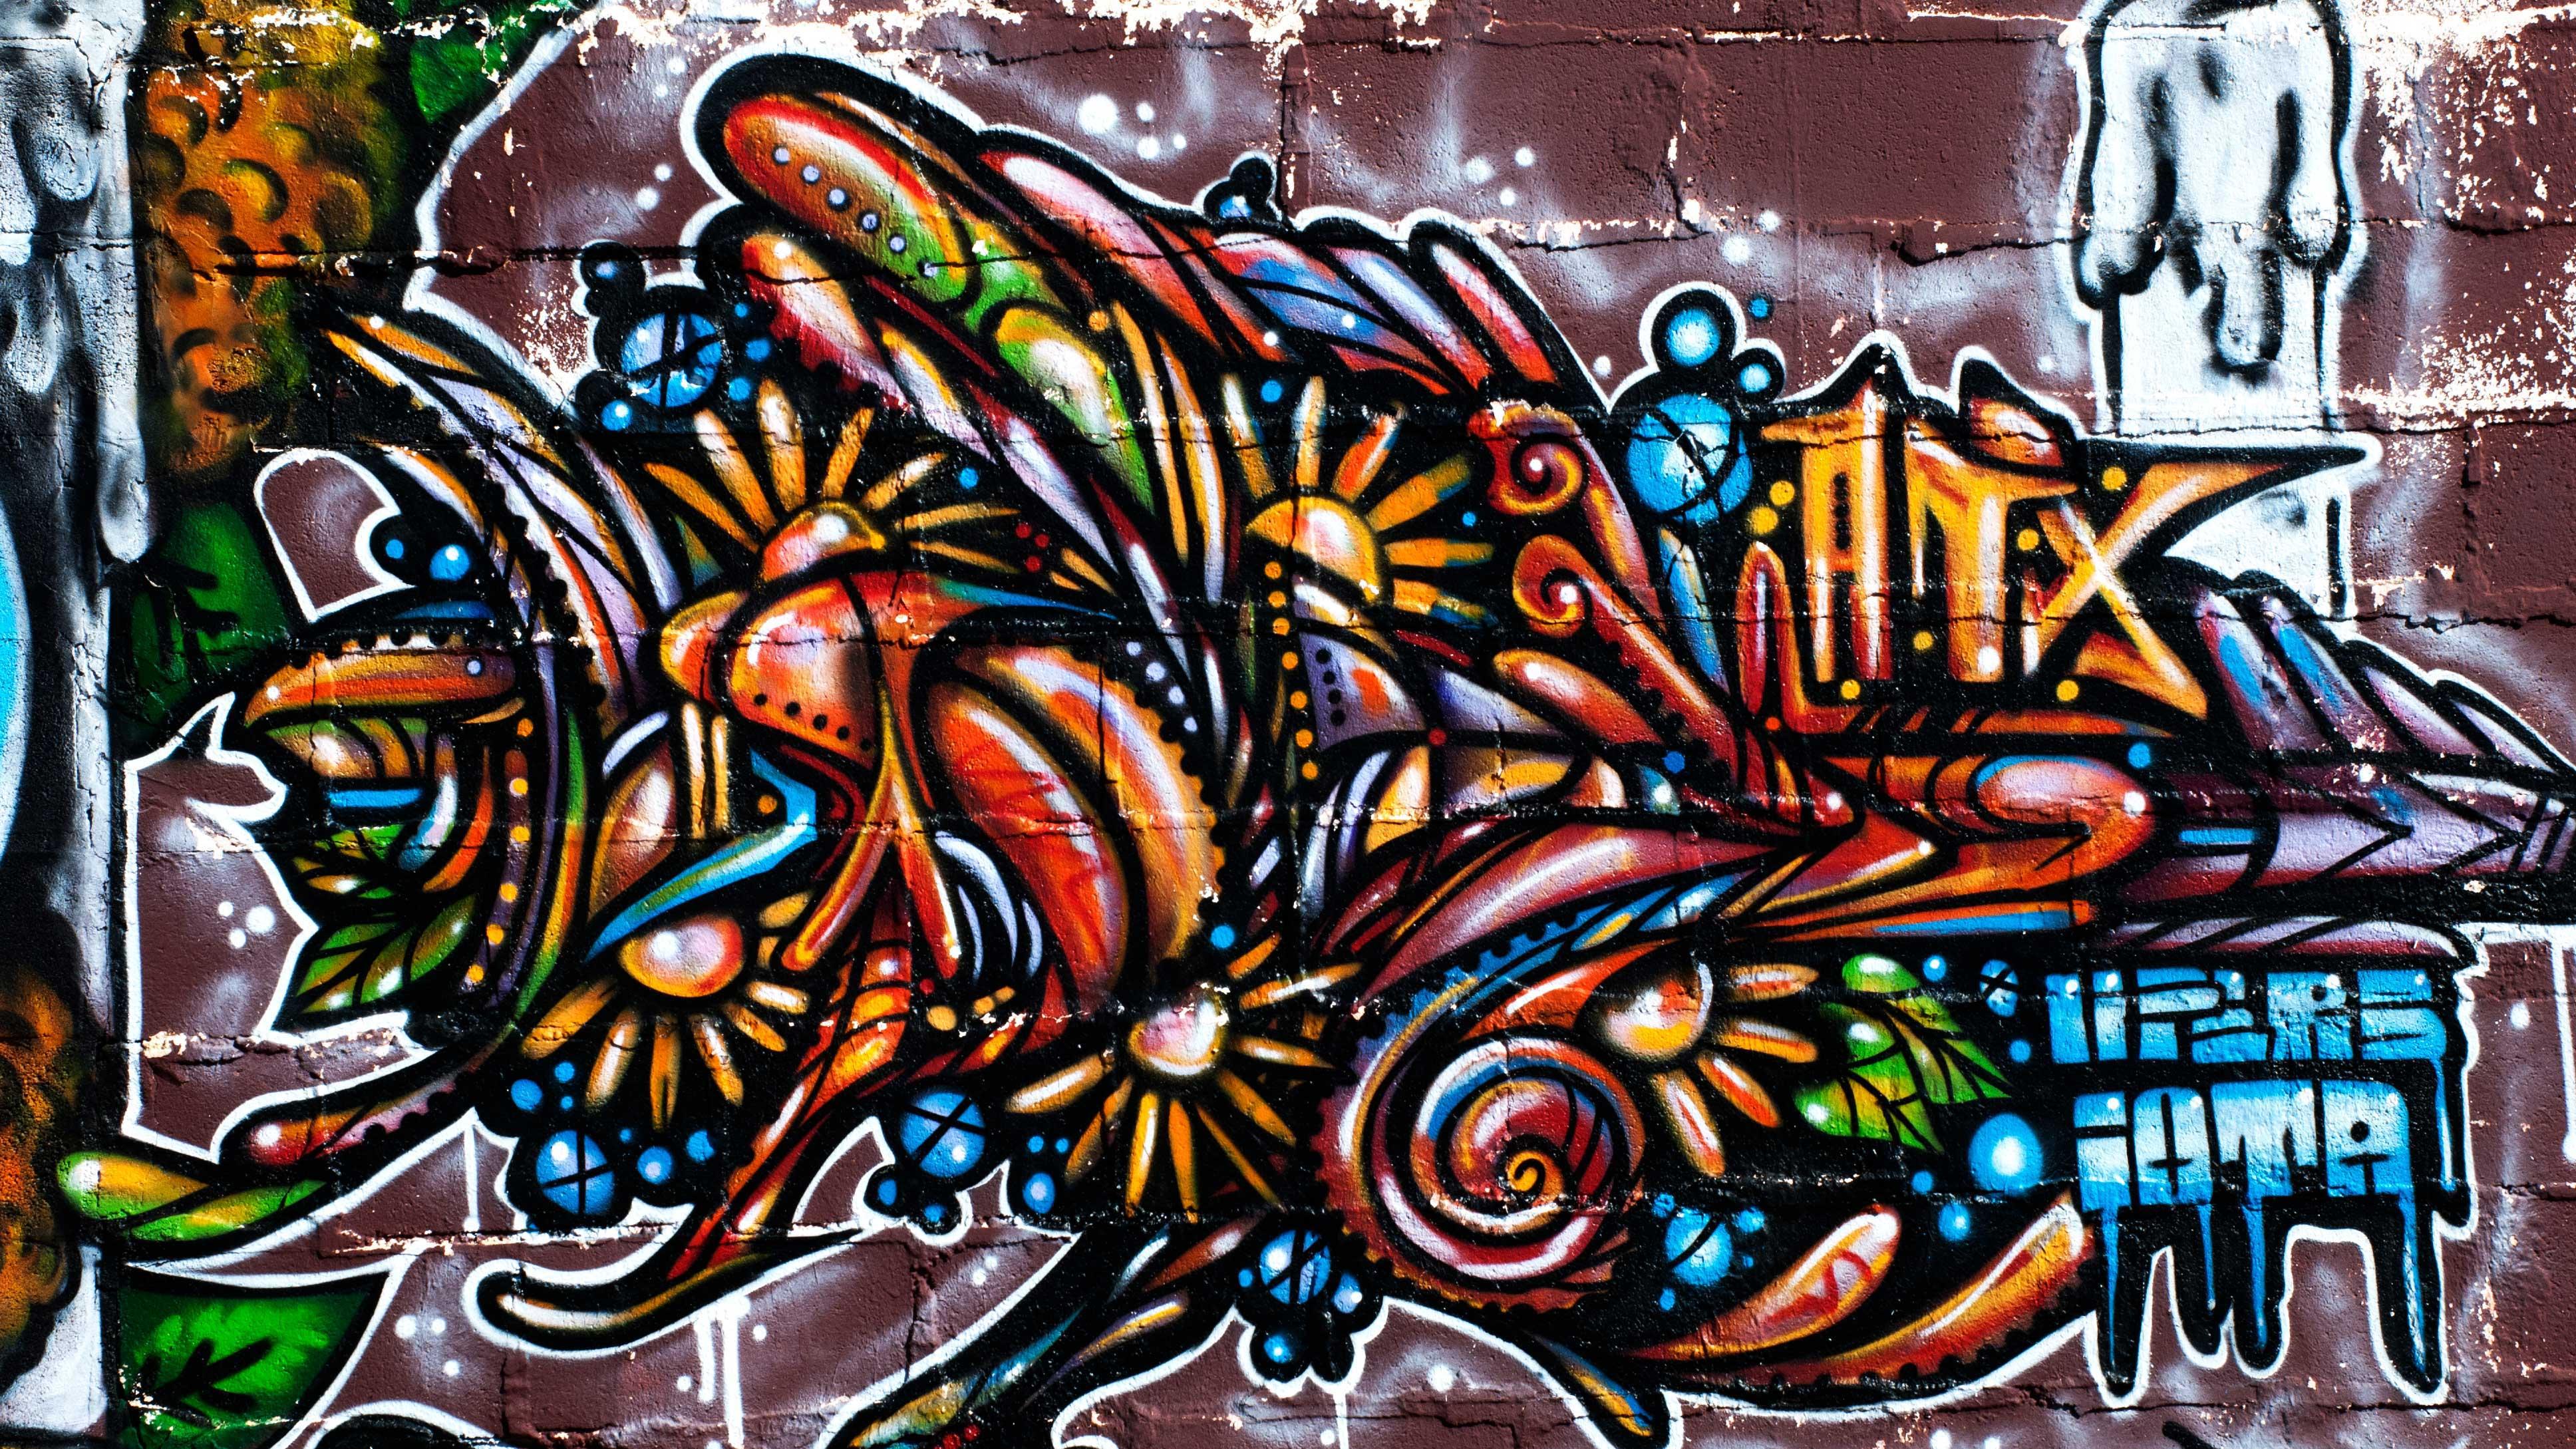 Cool Graffiti Wallpaper Designs Cool colorful 3872x2178